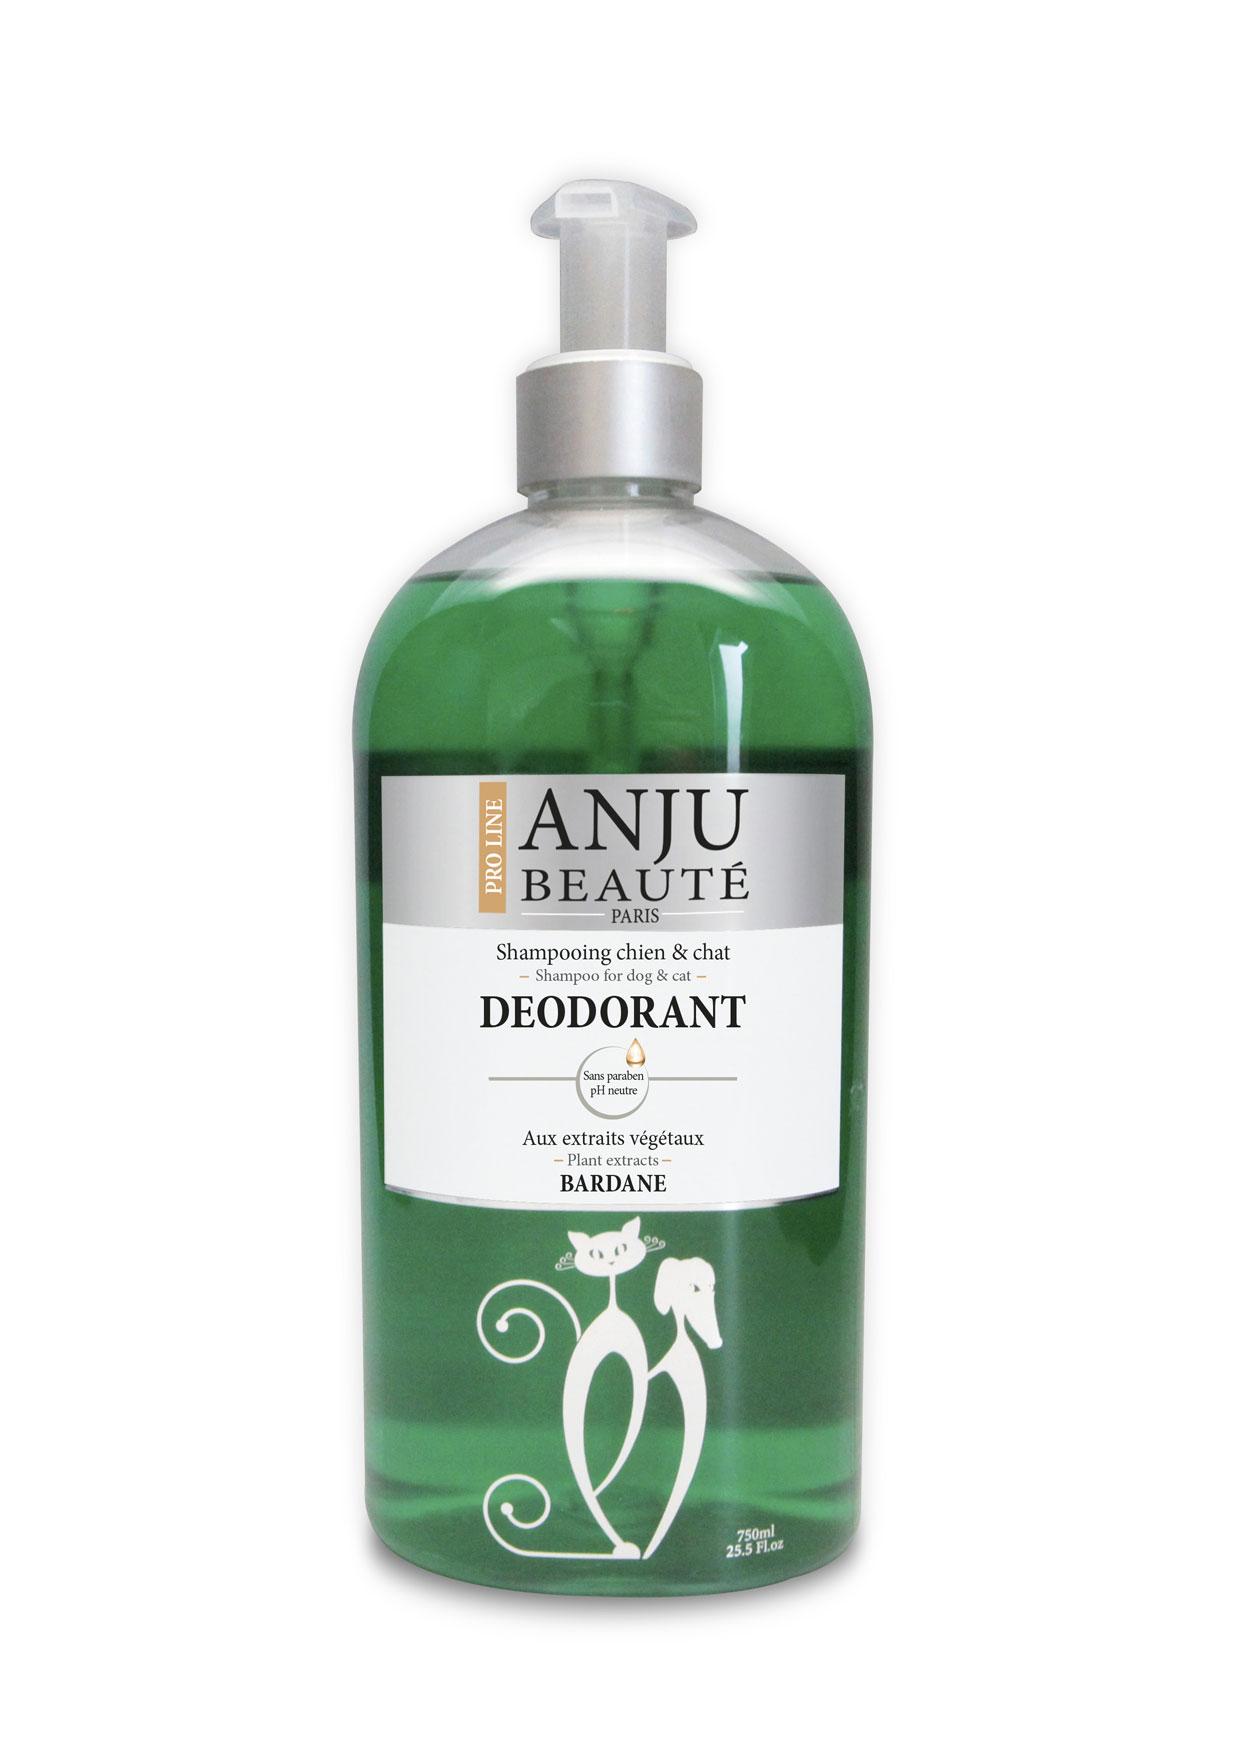 Shampoing ANJU Beauté déodorant 750 ML